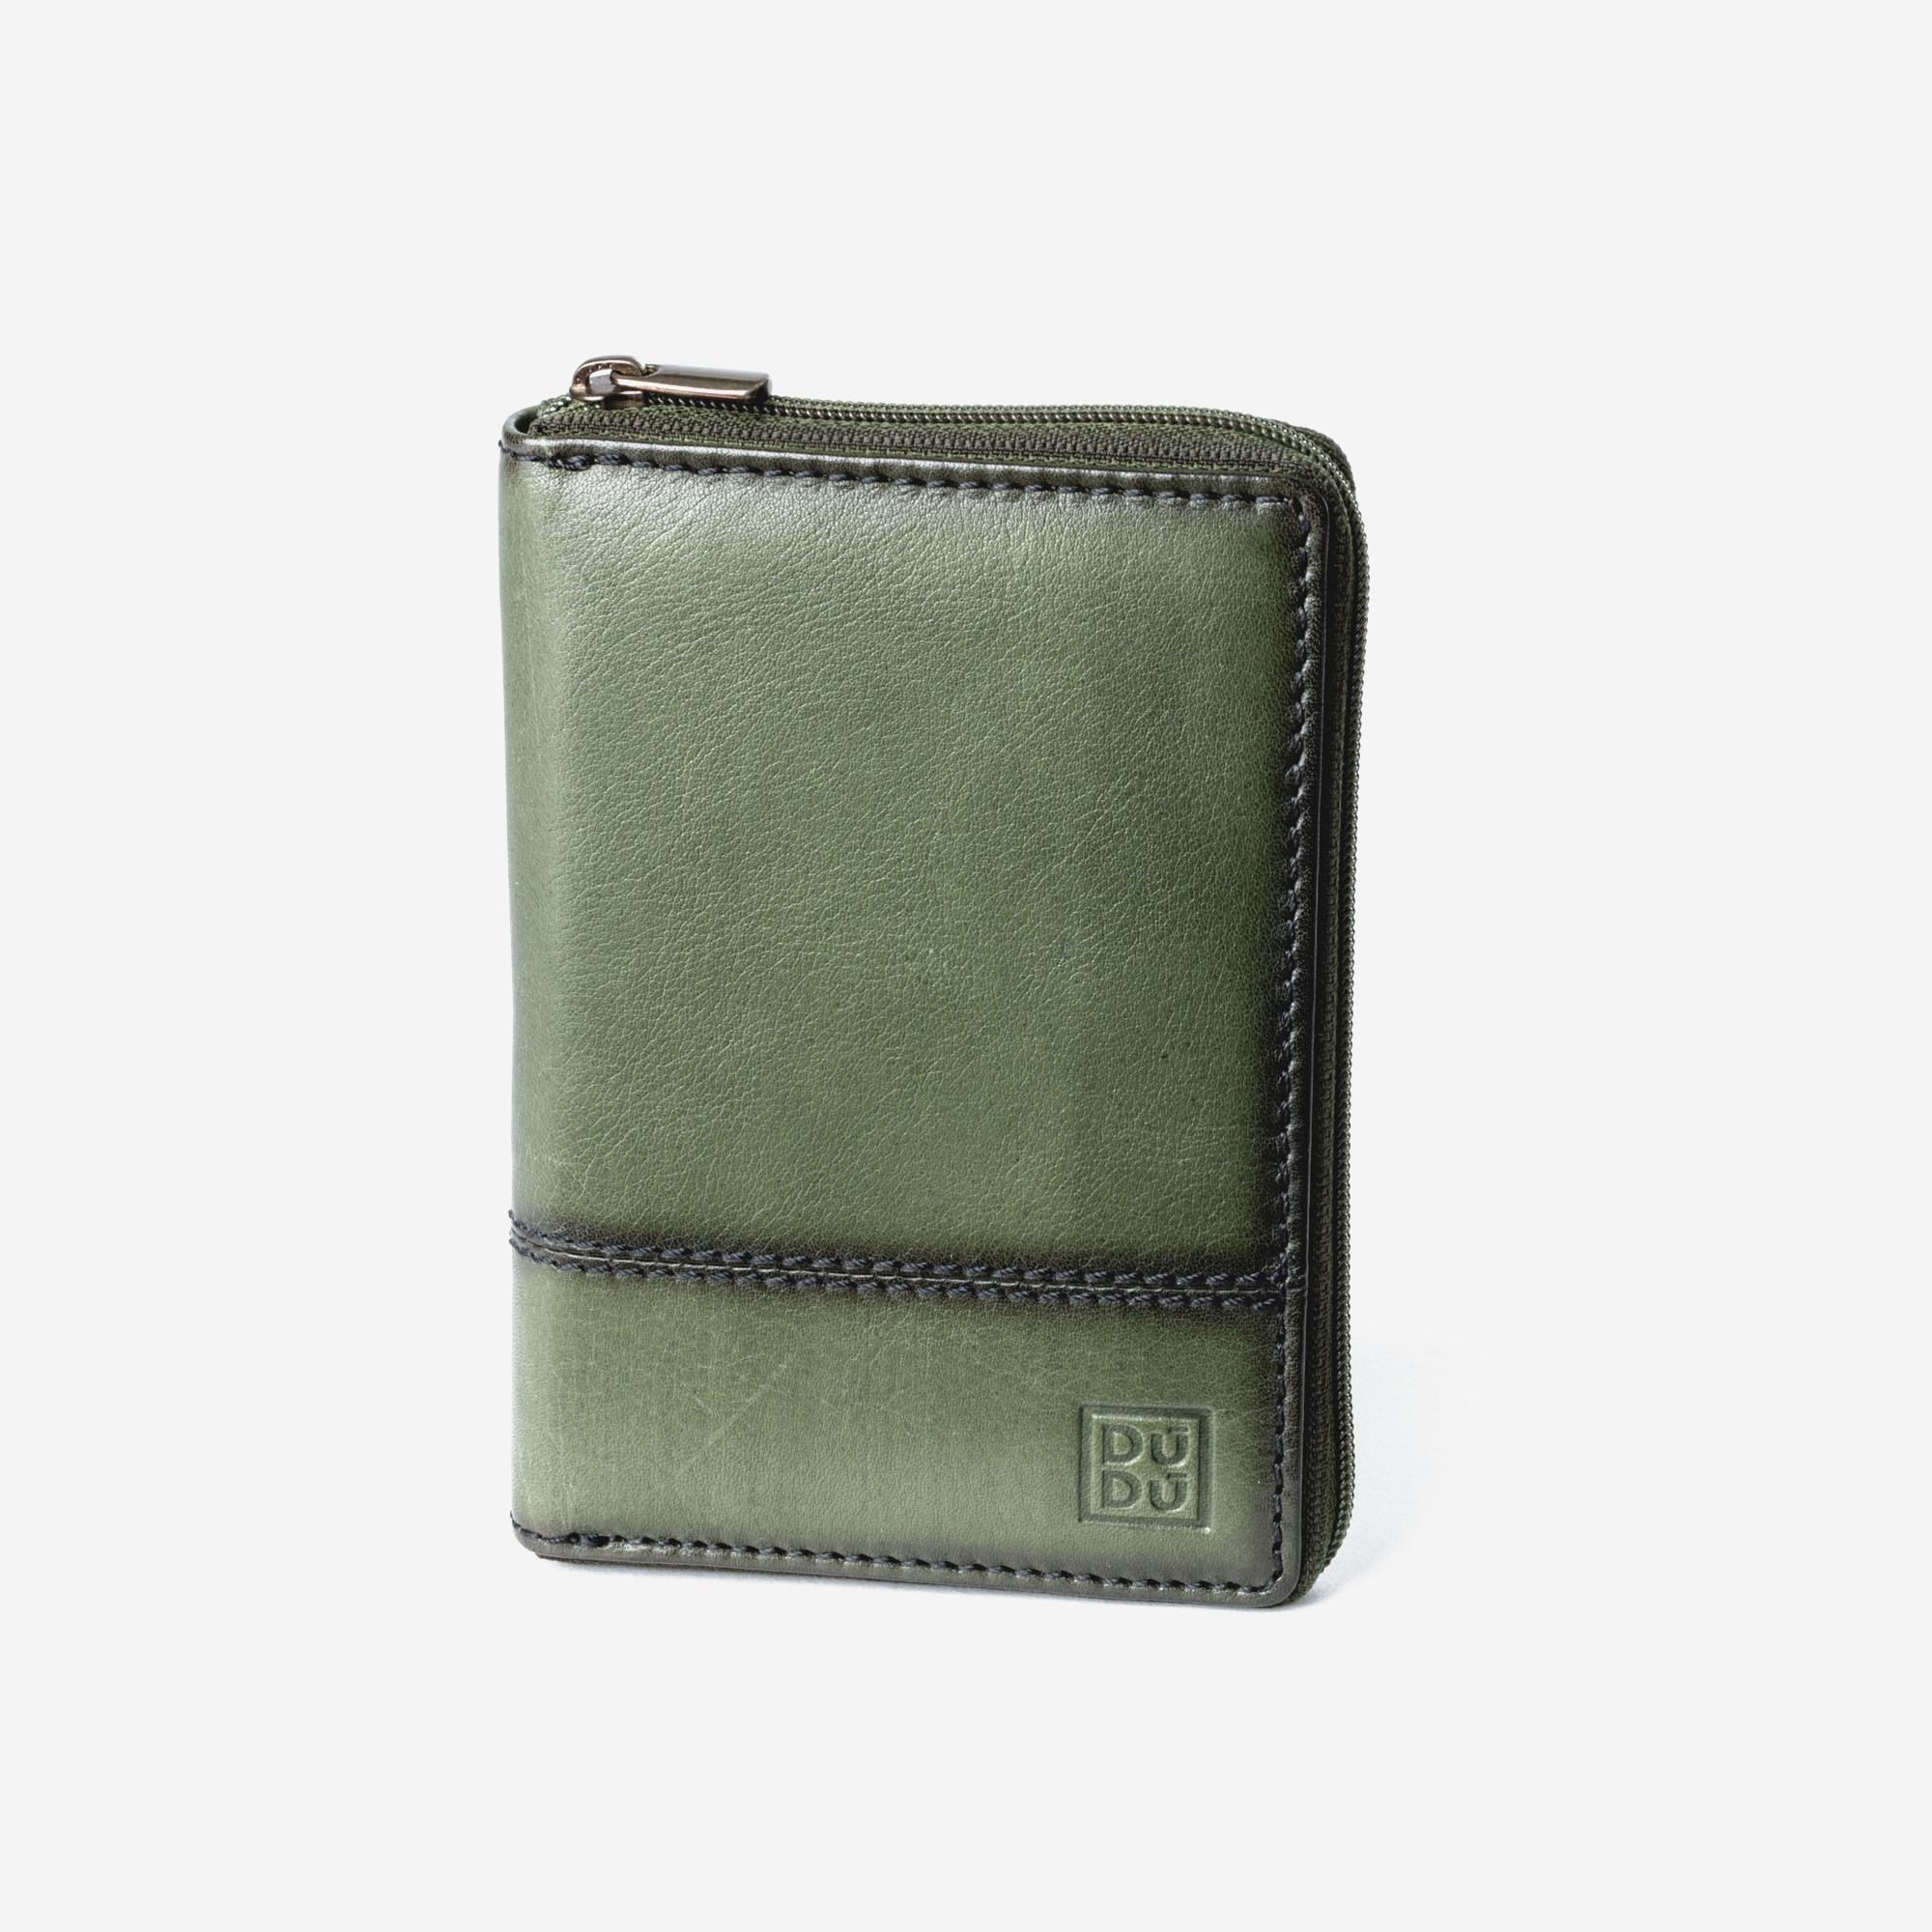 6f05d3207f888 Flat pouch 594-1704 Havana ~ Pouch